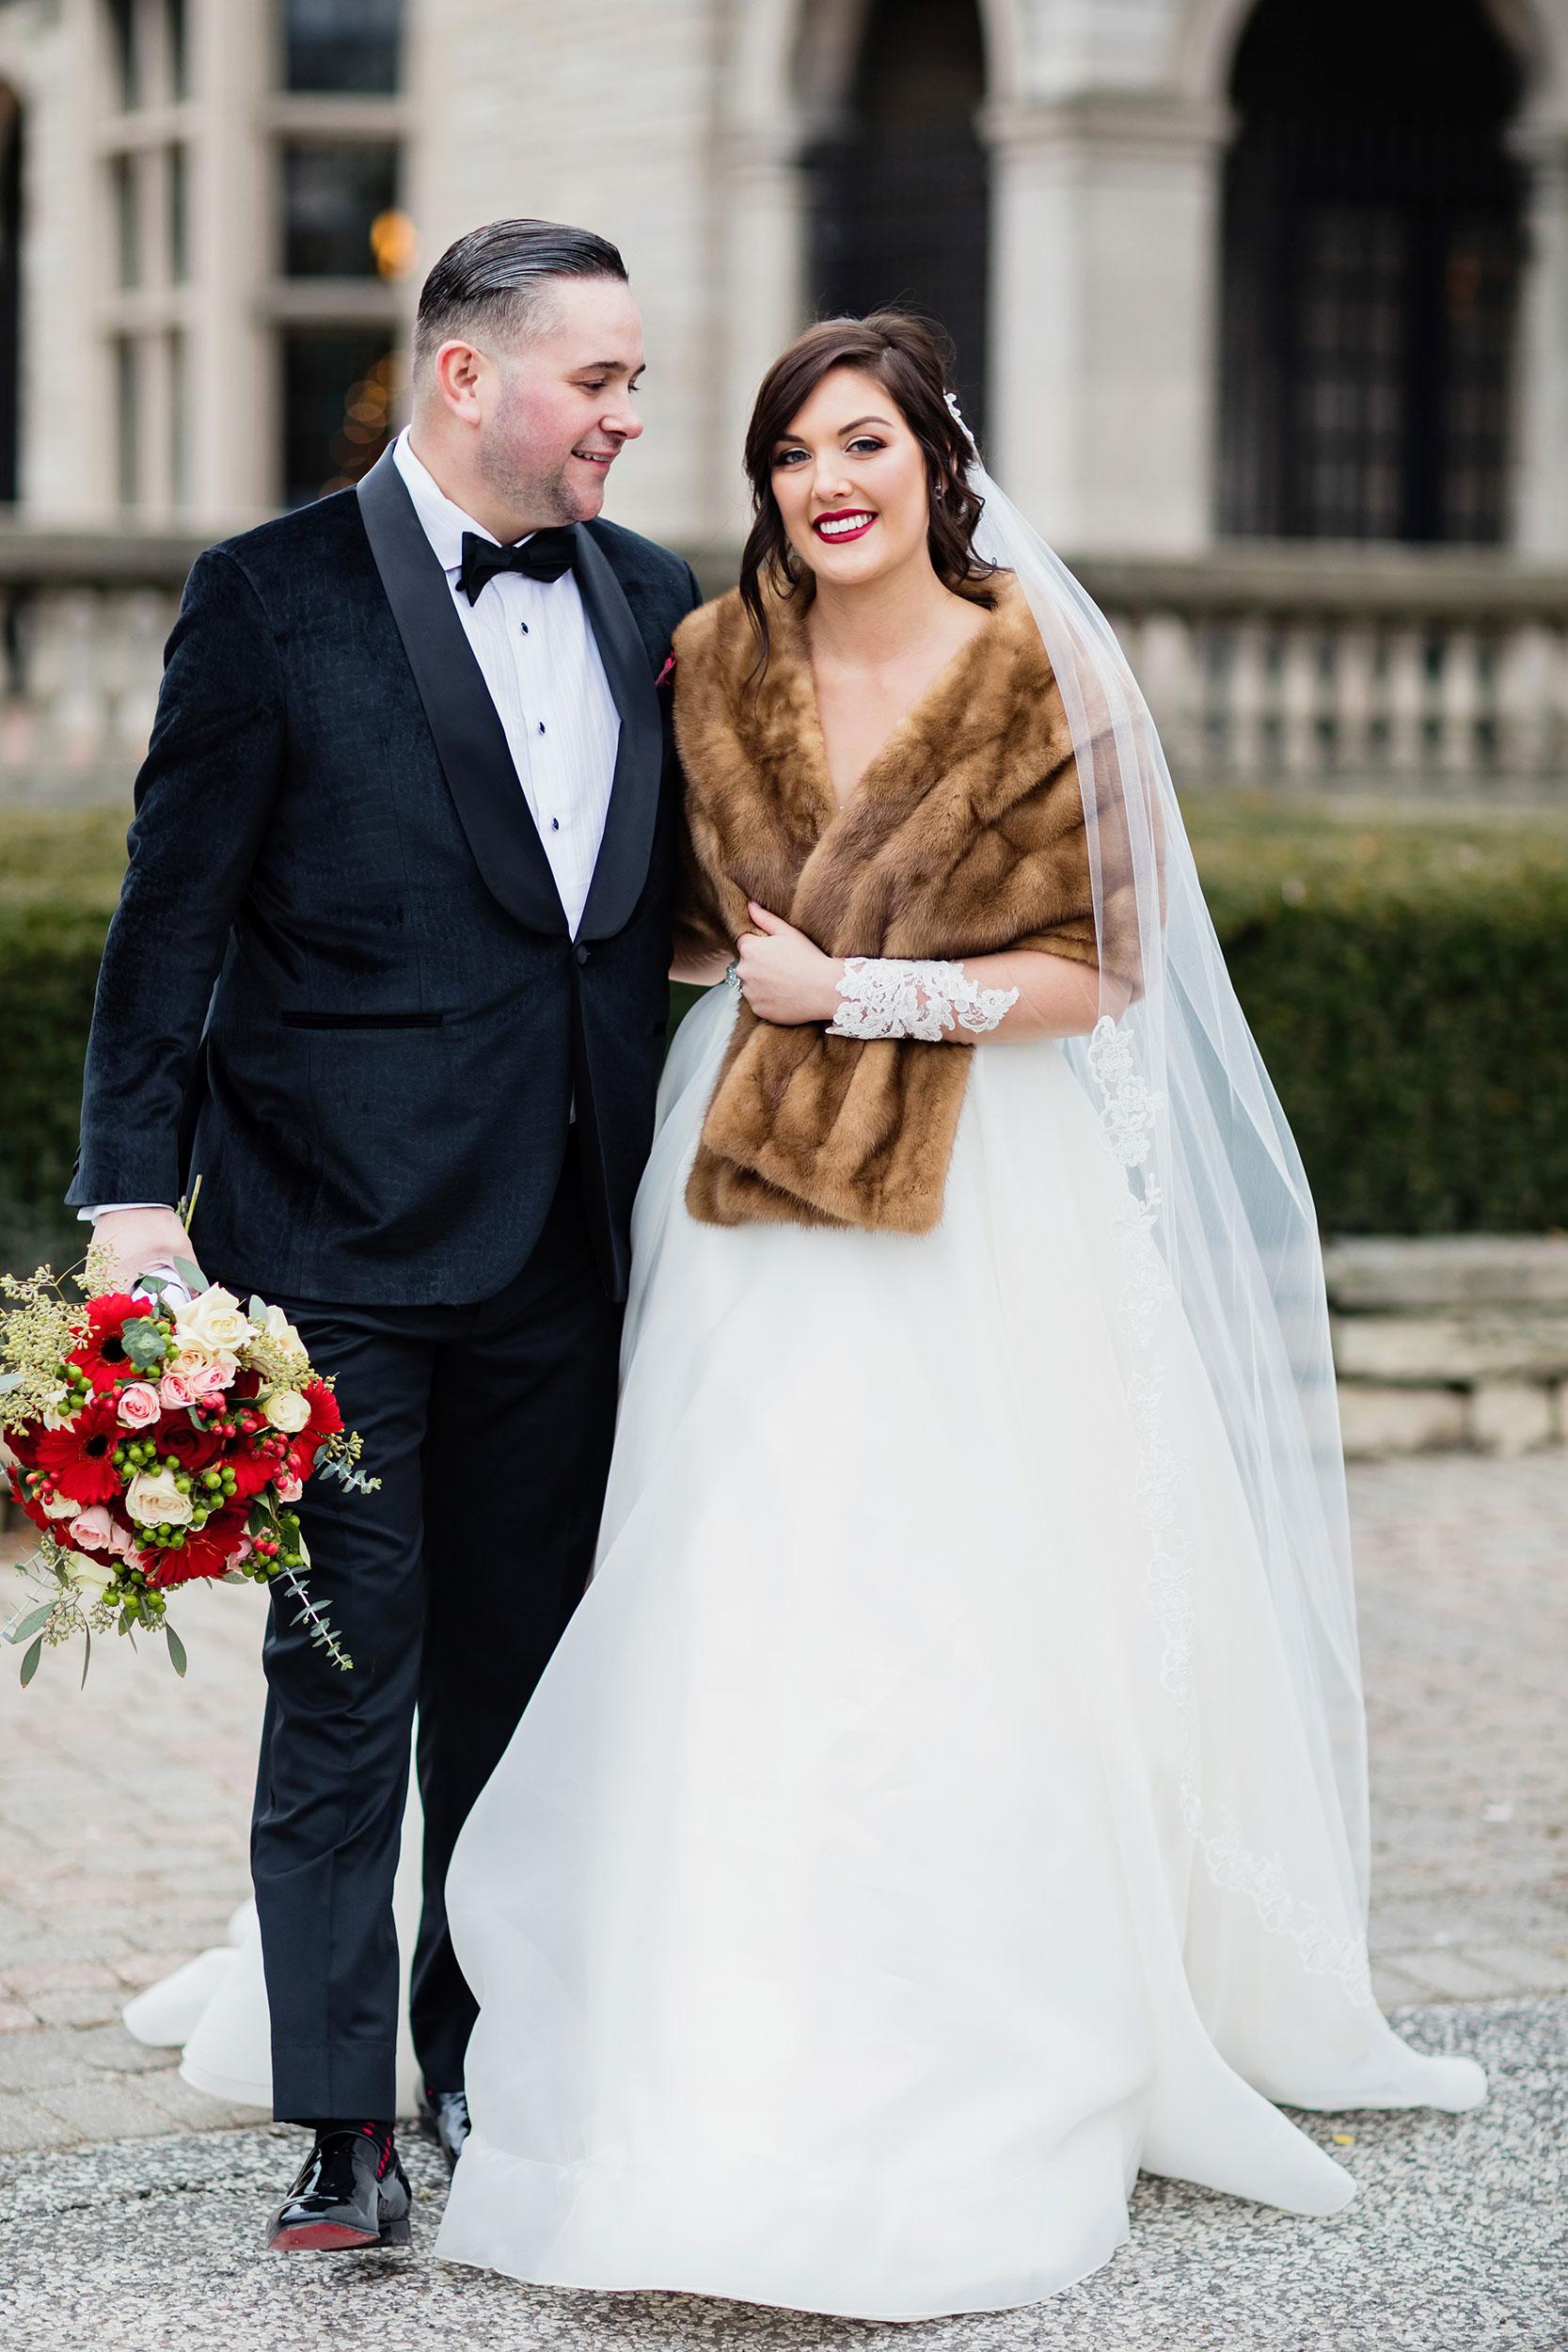 stylish-wedding-photography-windsor-toronto-ontario-wedding-photographer-willistead-manor-eryn-shea-photography-31.JPG